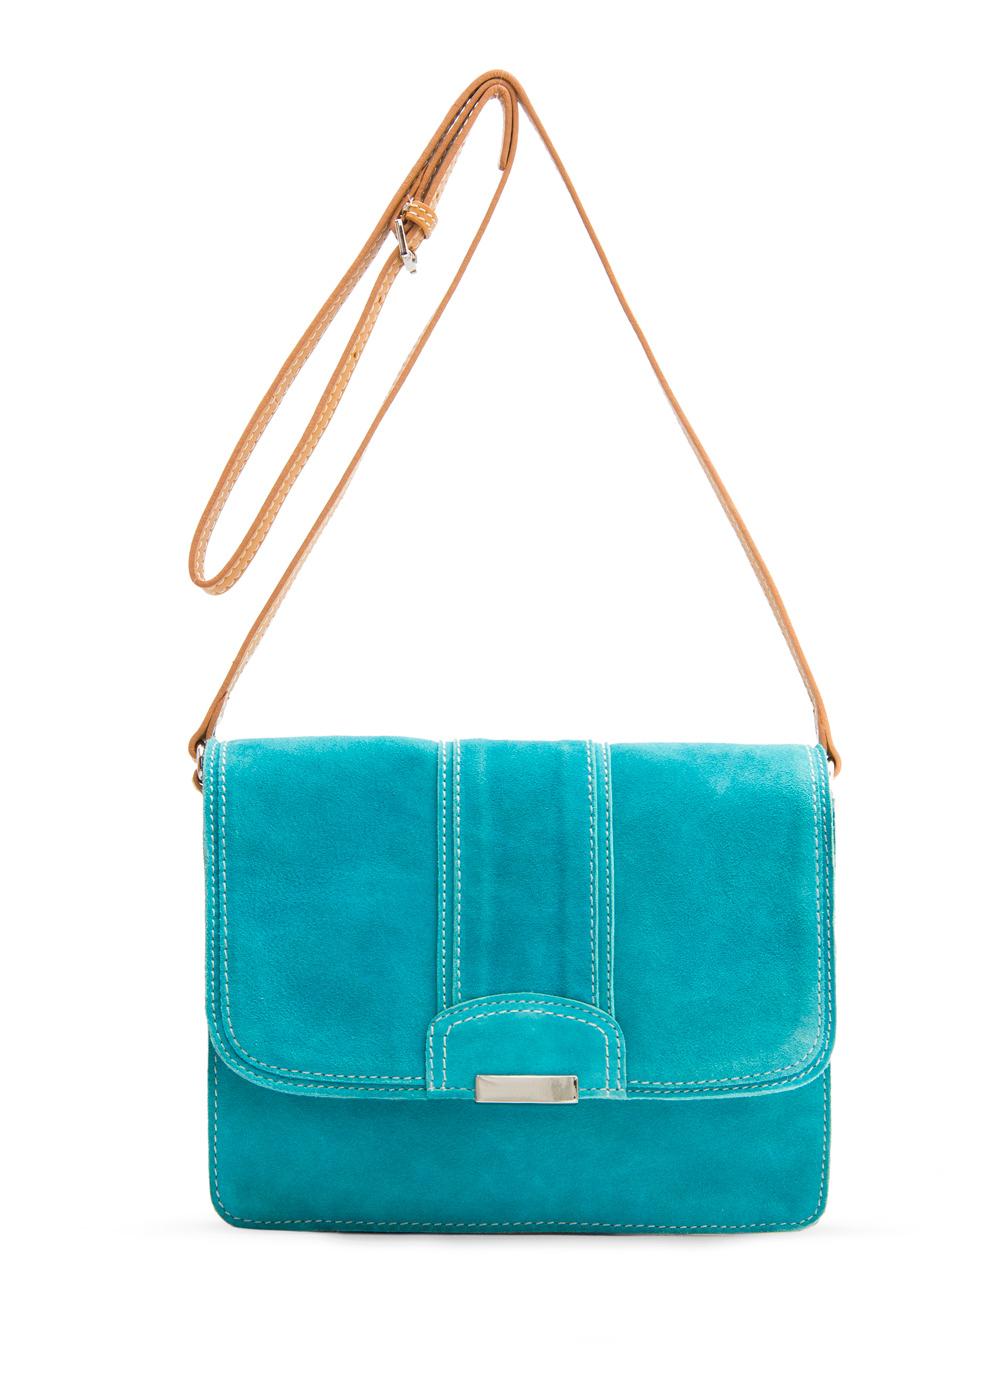 Seriousasahtexon — Замшевые сумки по приемлемым ценам от 1500... cdf0f968c4cc7